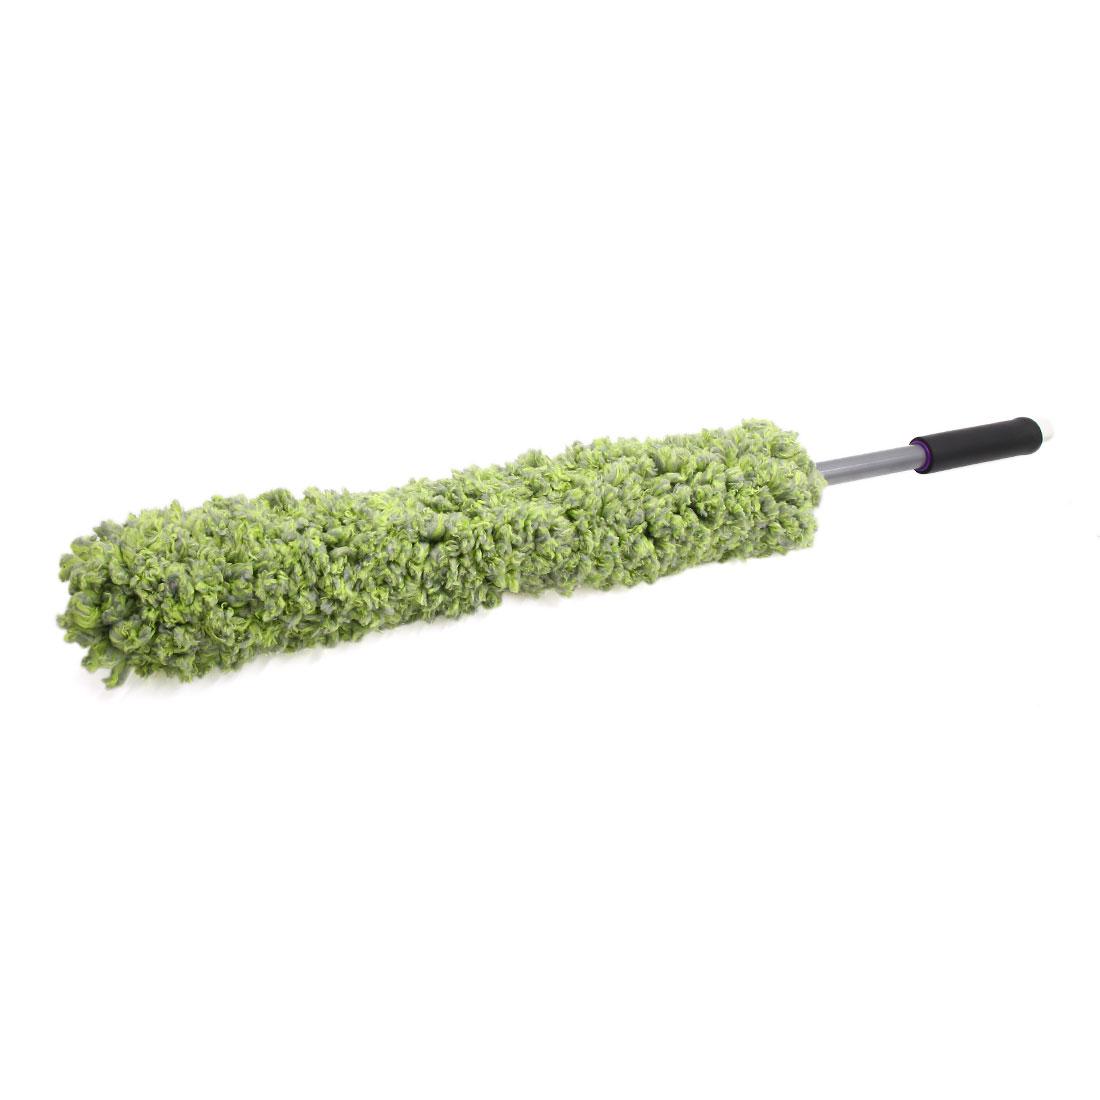 Green Soft Microfiber Plastic Handle Car Duster Dusting Mop Tool